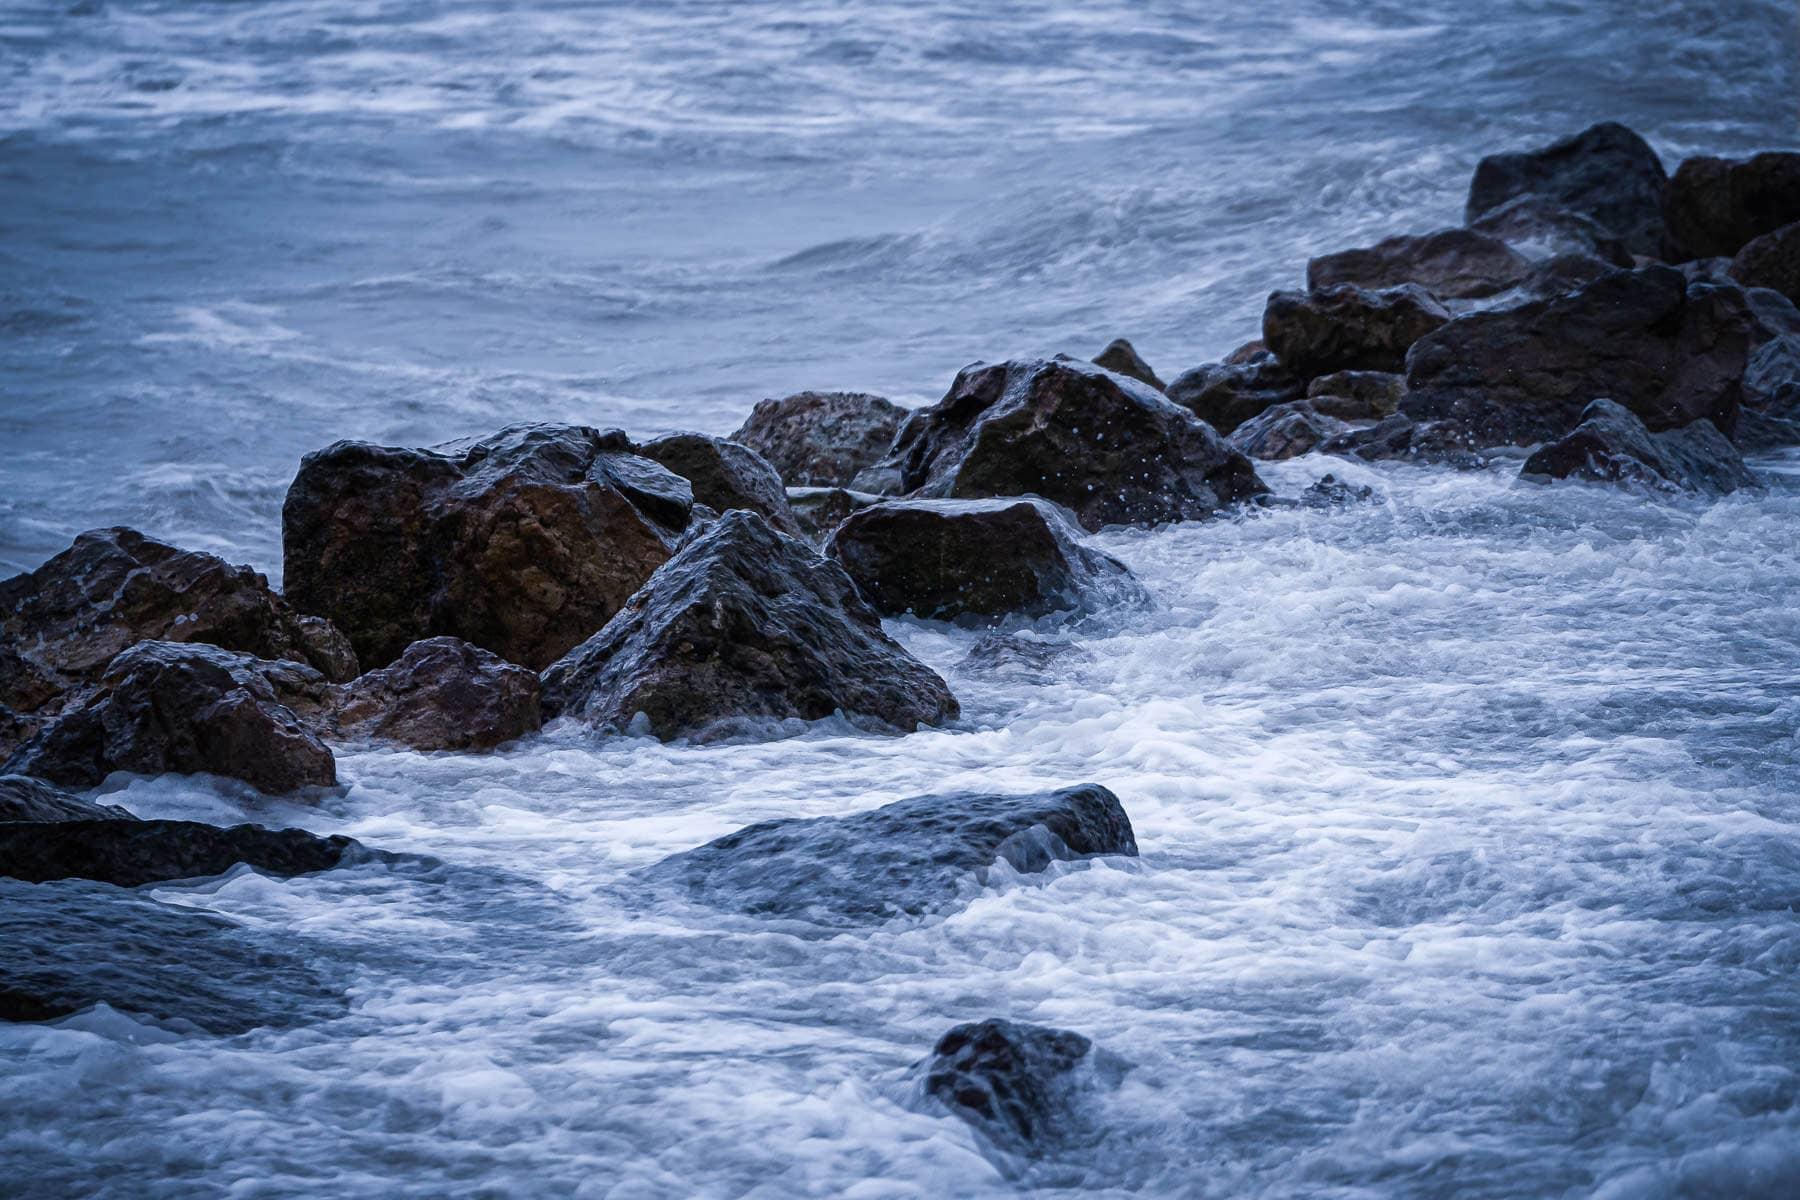 Gulf of Mexico waves splash over granite blocks acting as breakwaters along the Galveston, Texas, beach.